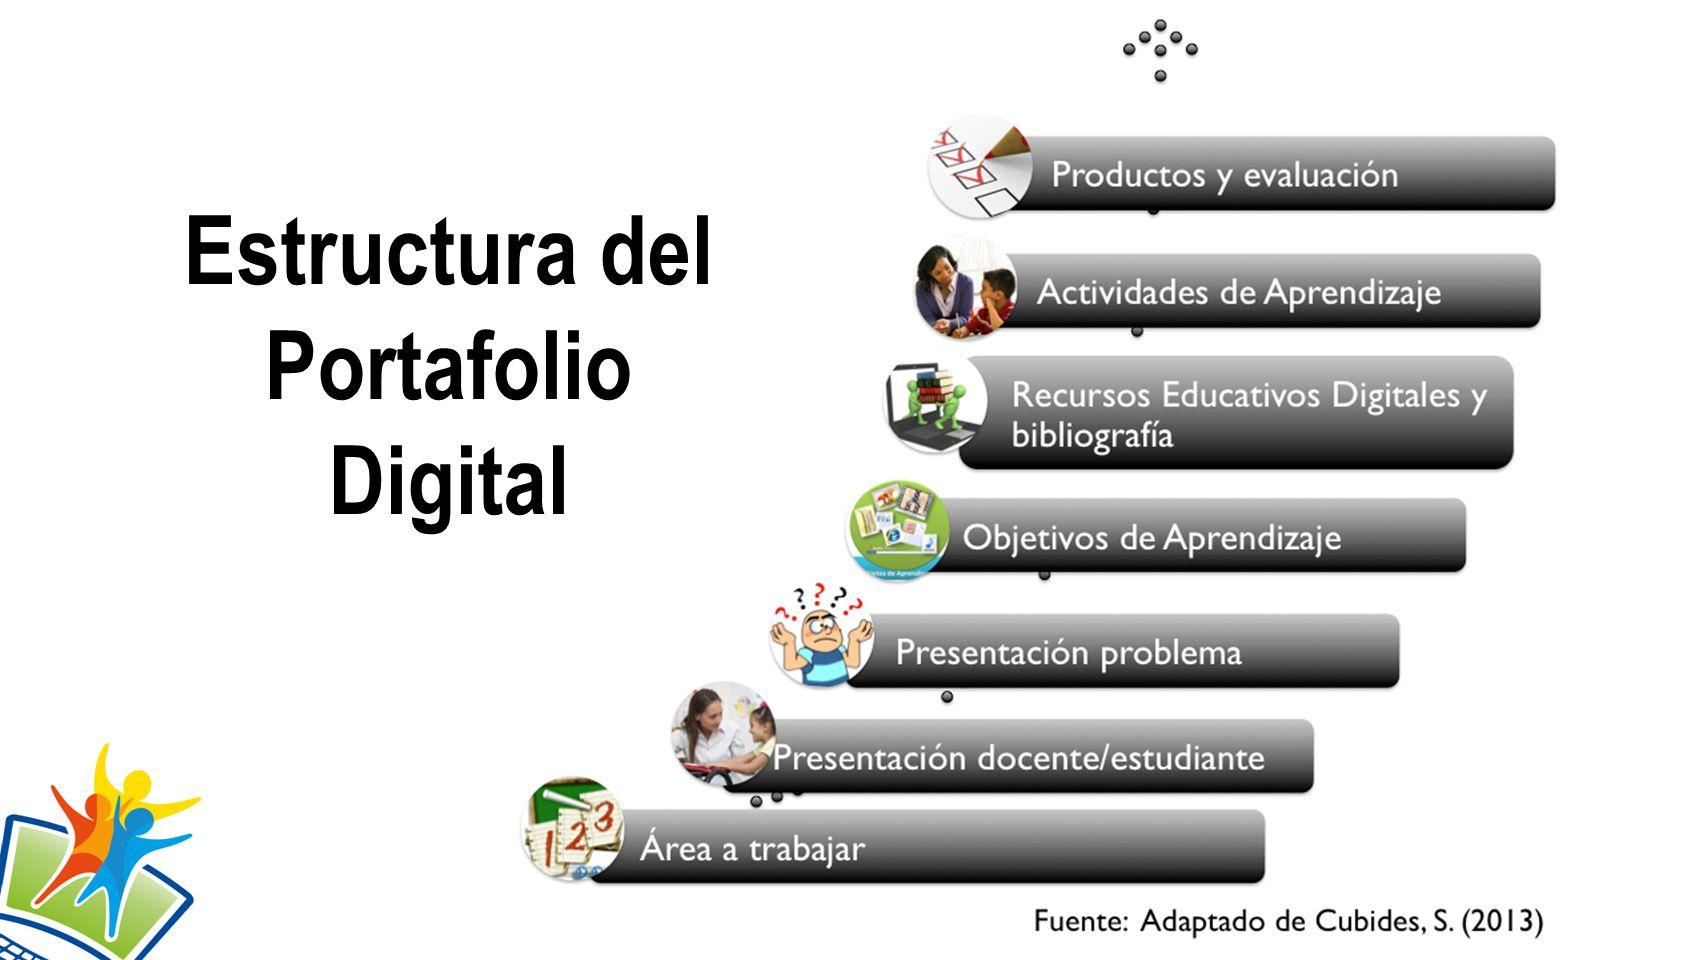 Estructura del Portafolio Digital